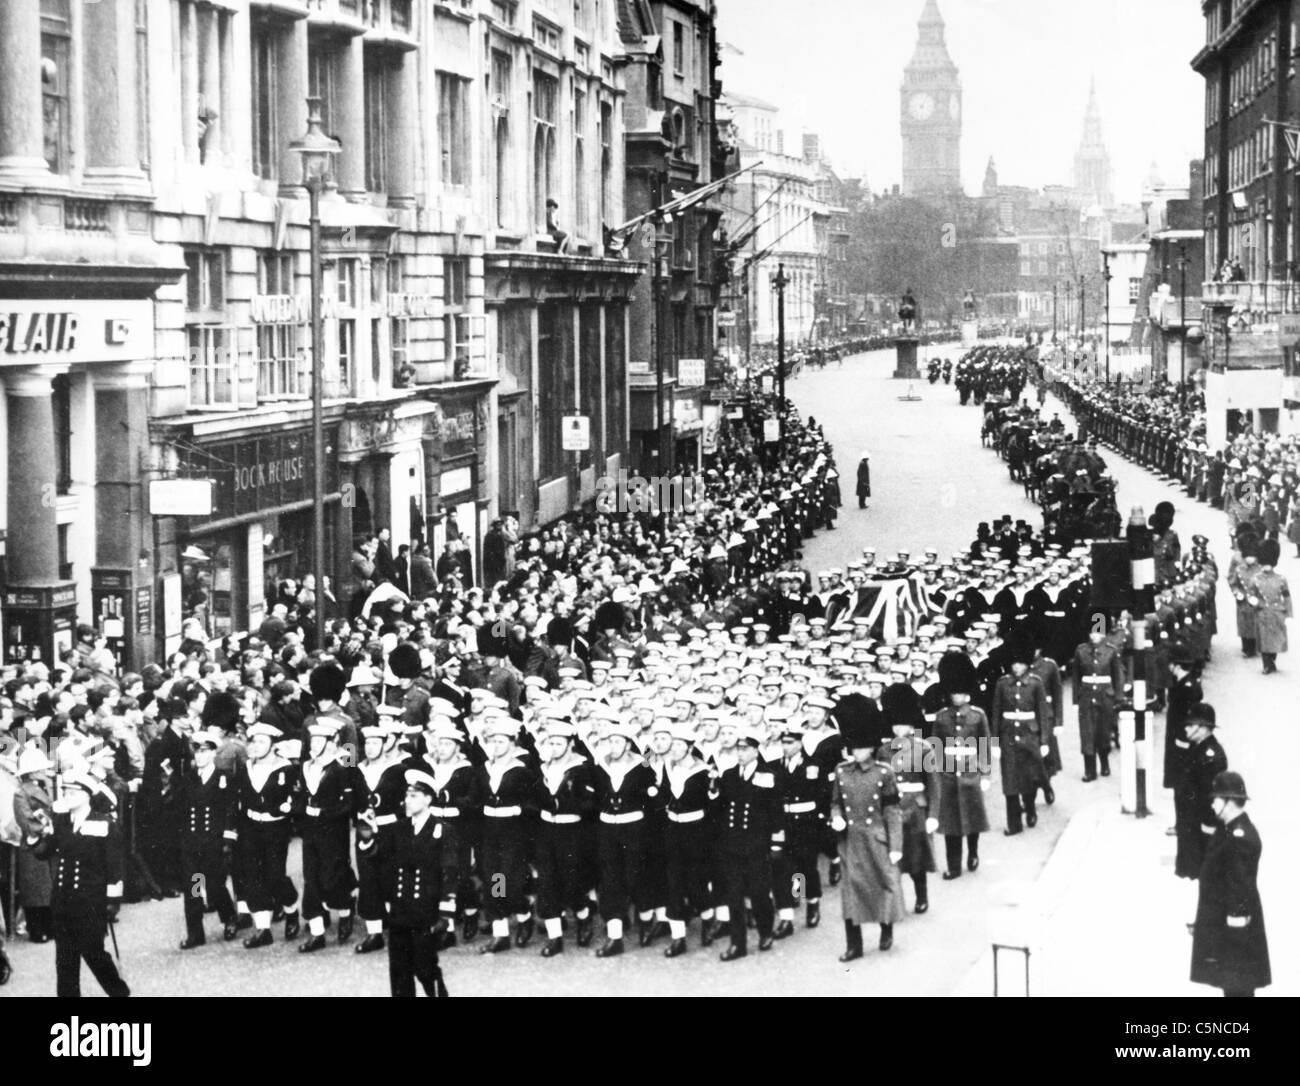 winston churchill funeral - Stock Image